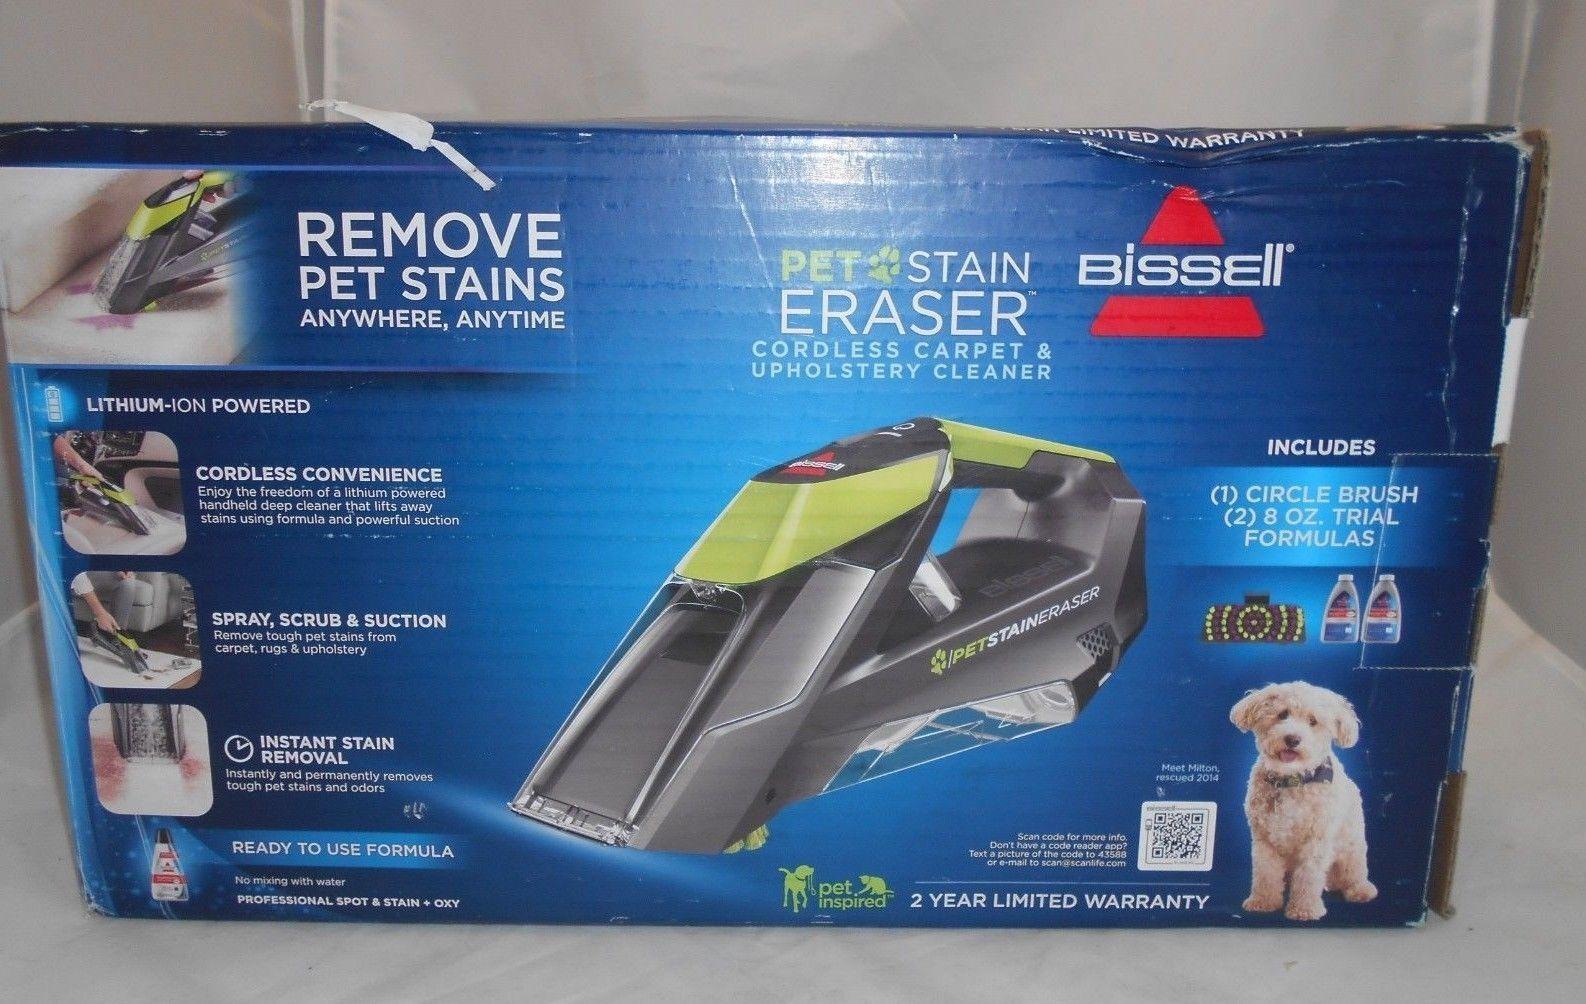 Bisell 2003 Pet Stain Eraser Cordless Upholstery Carpet Cleaner Ebay